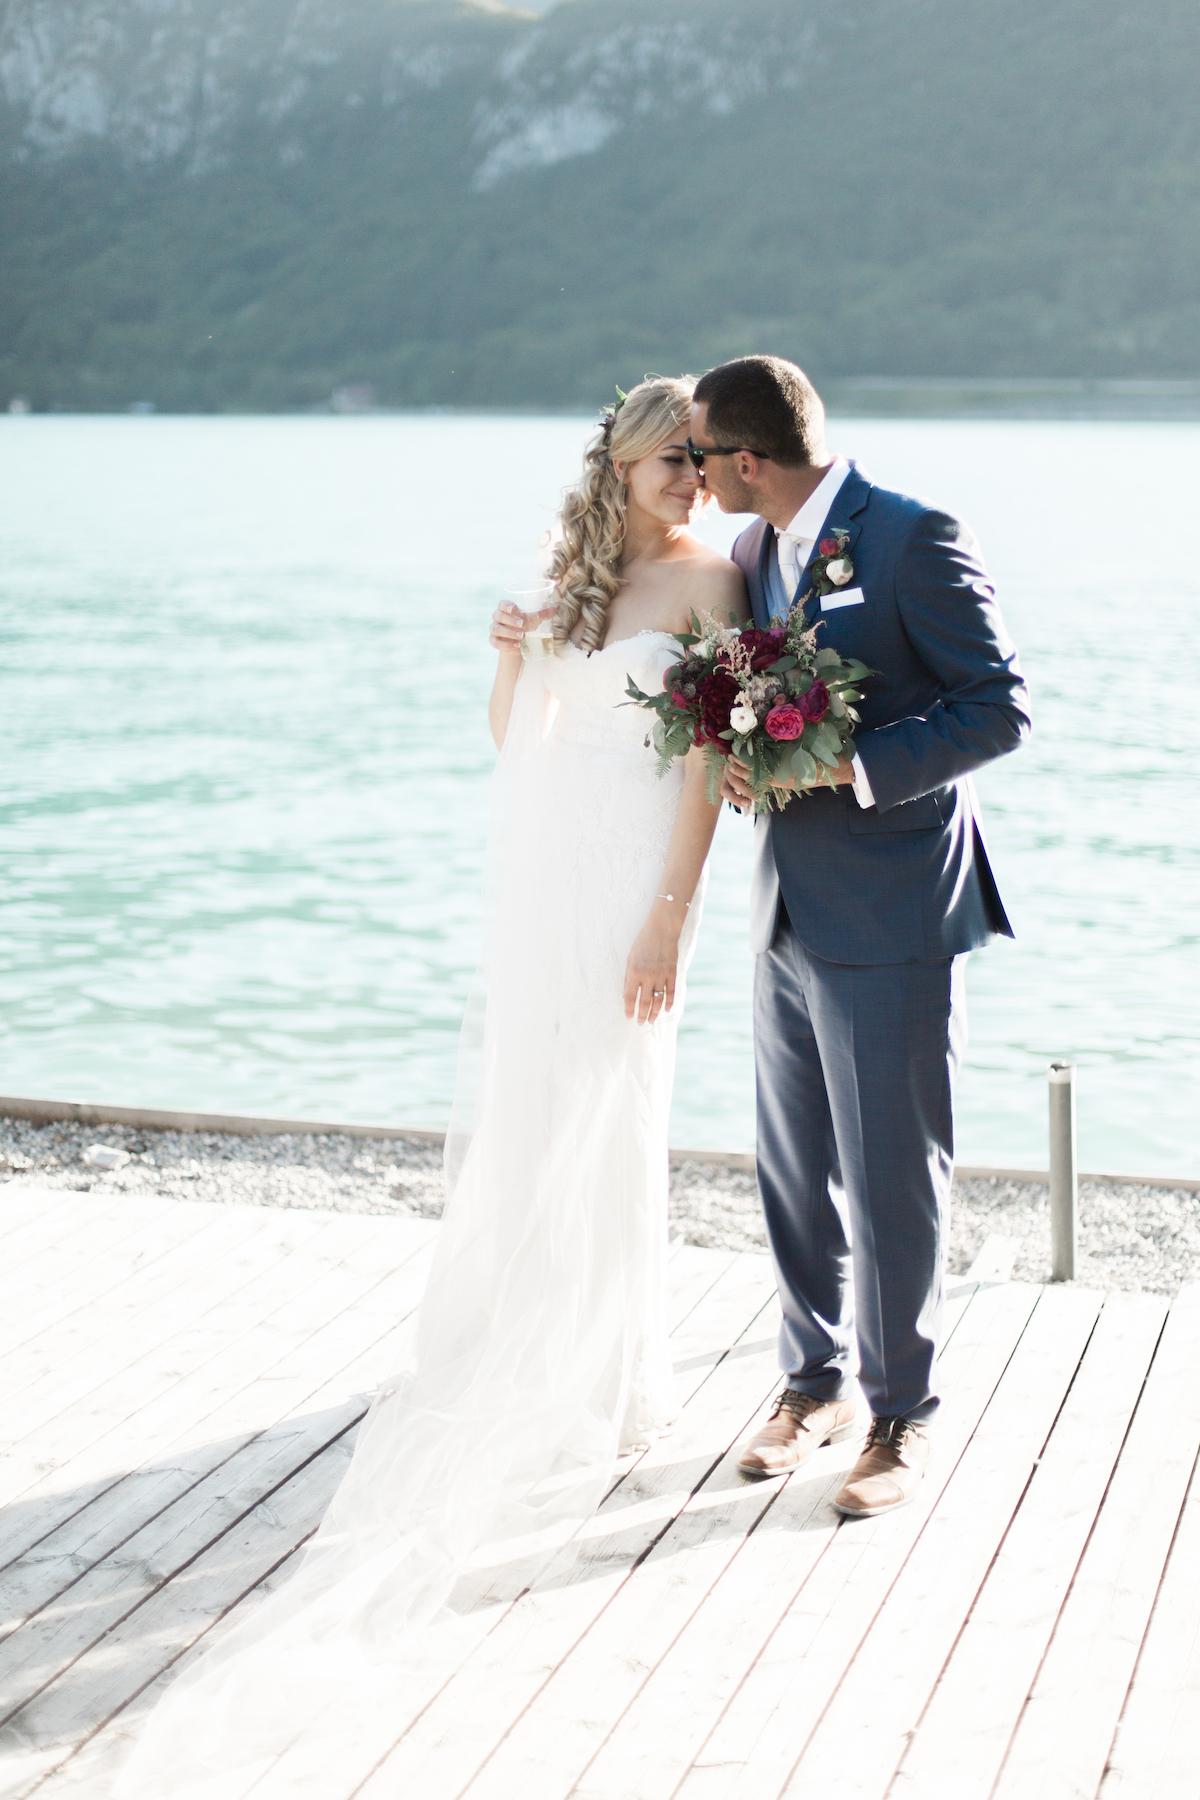 annecy-wedding-photos-199.jpg